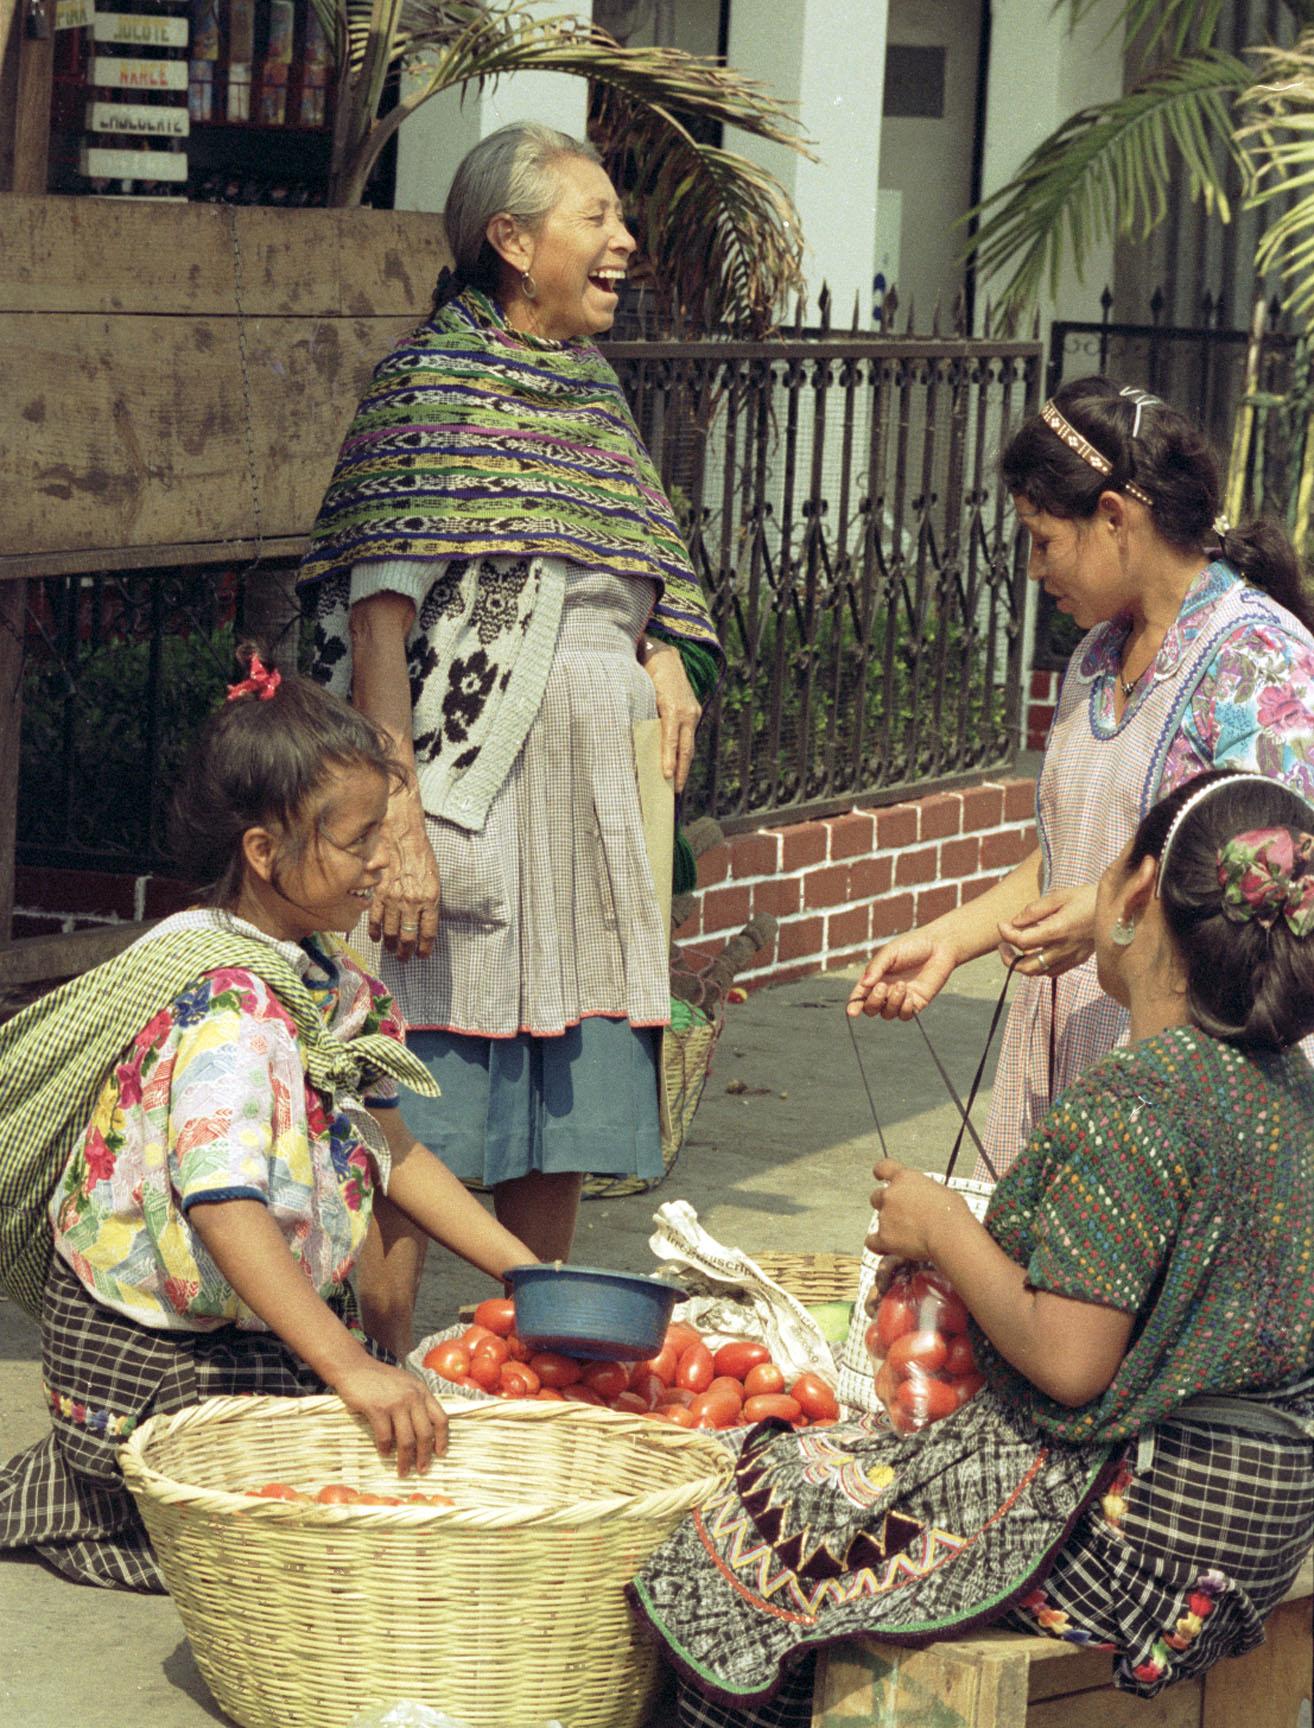 Guatemalans - 11